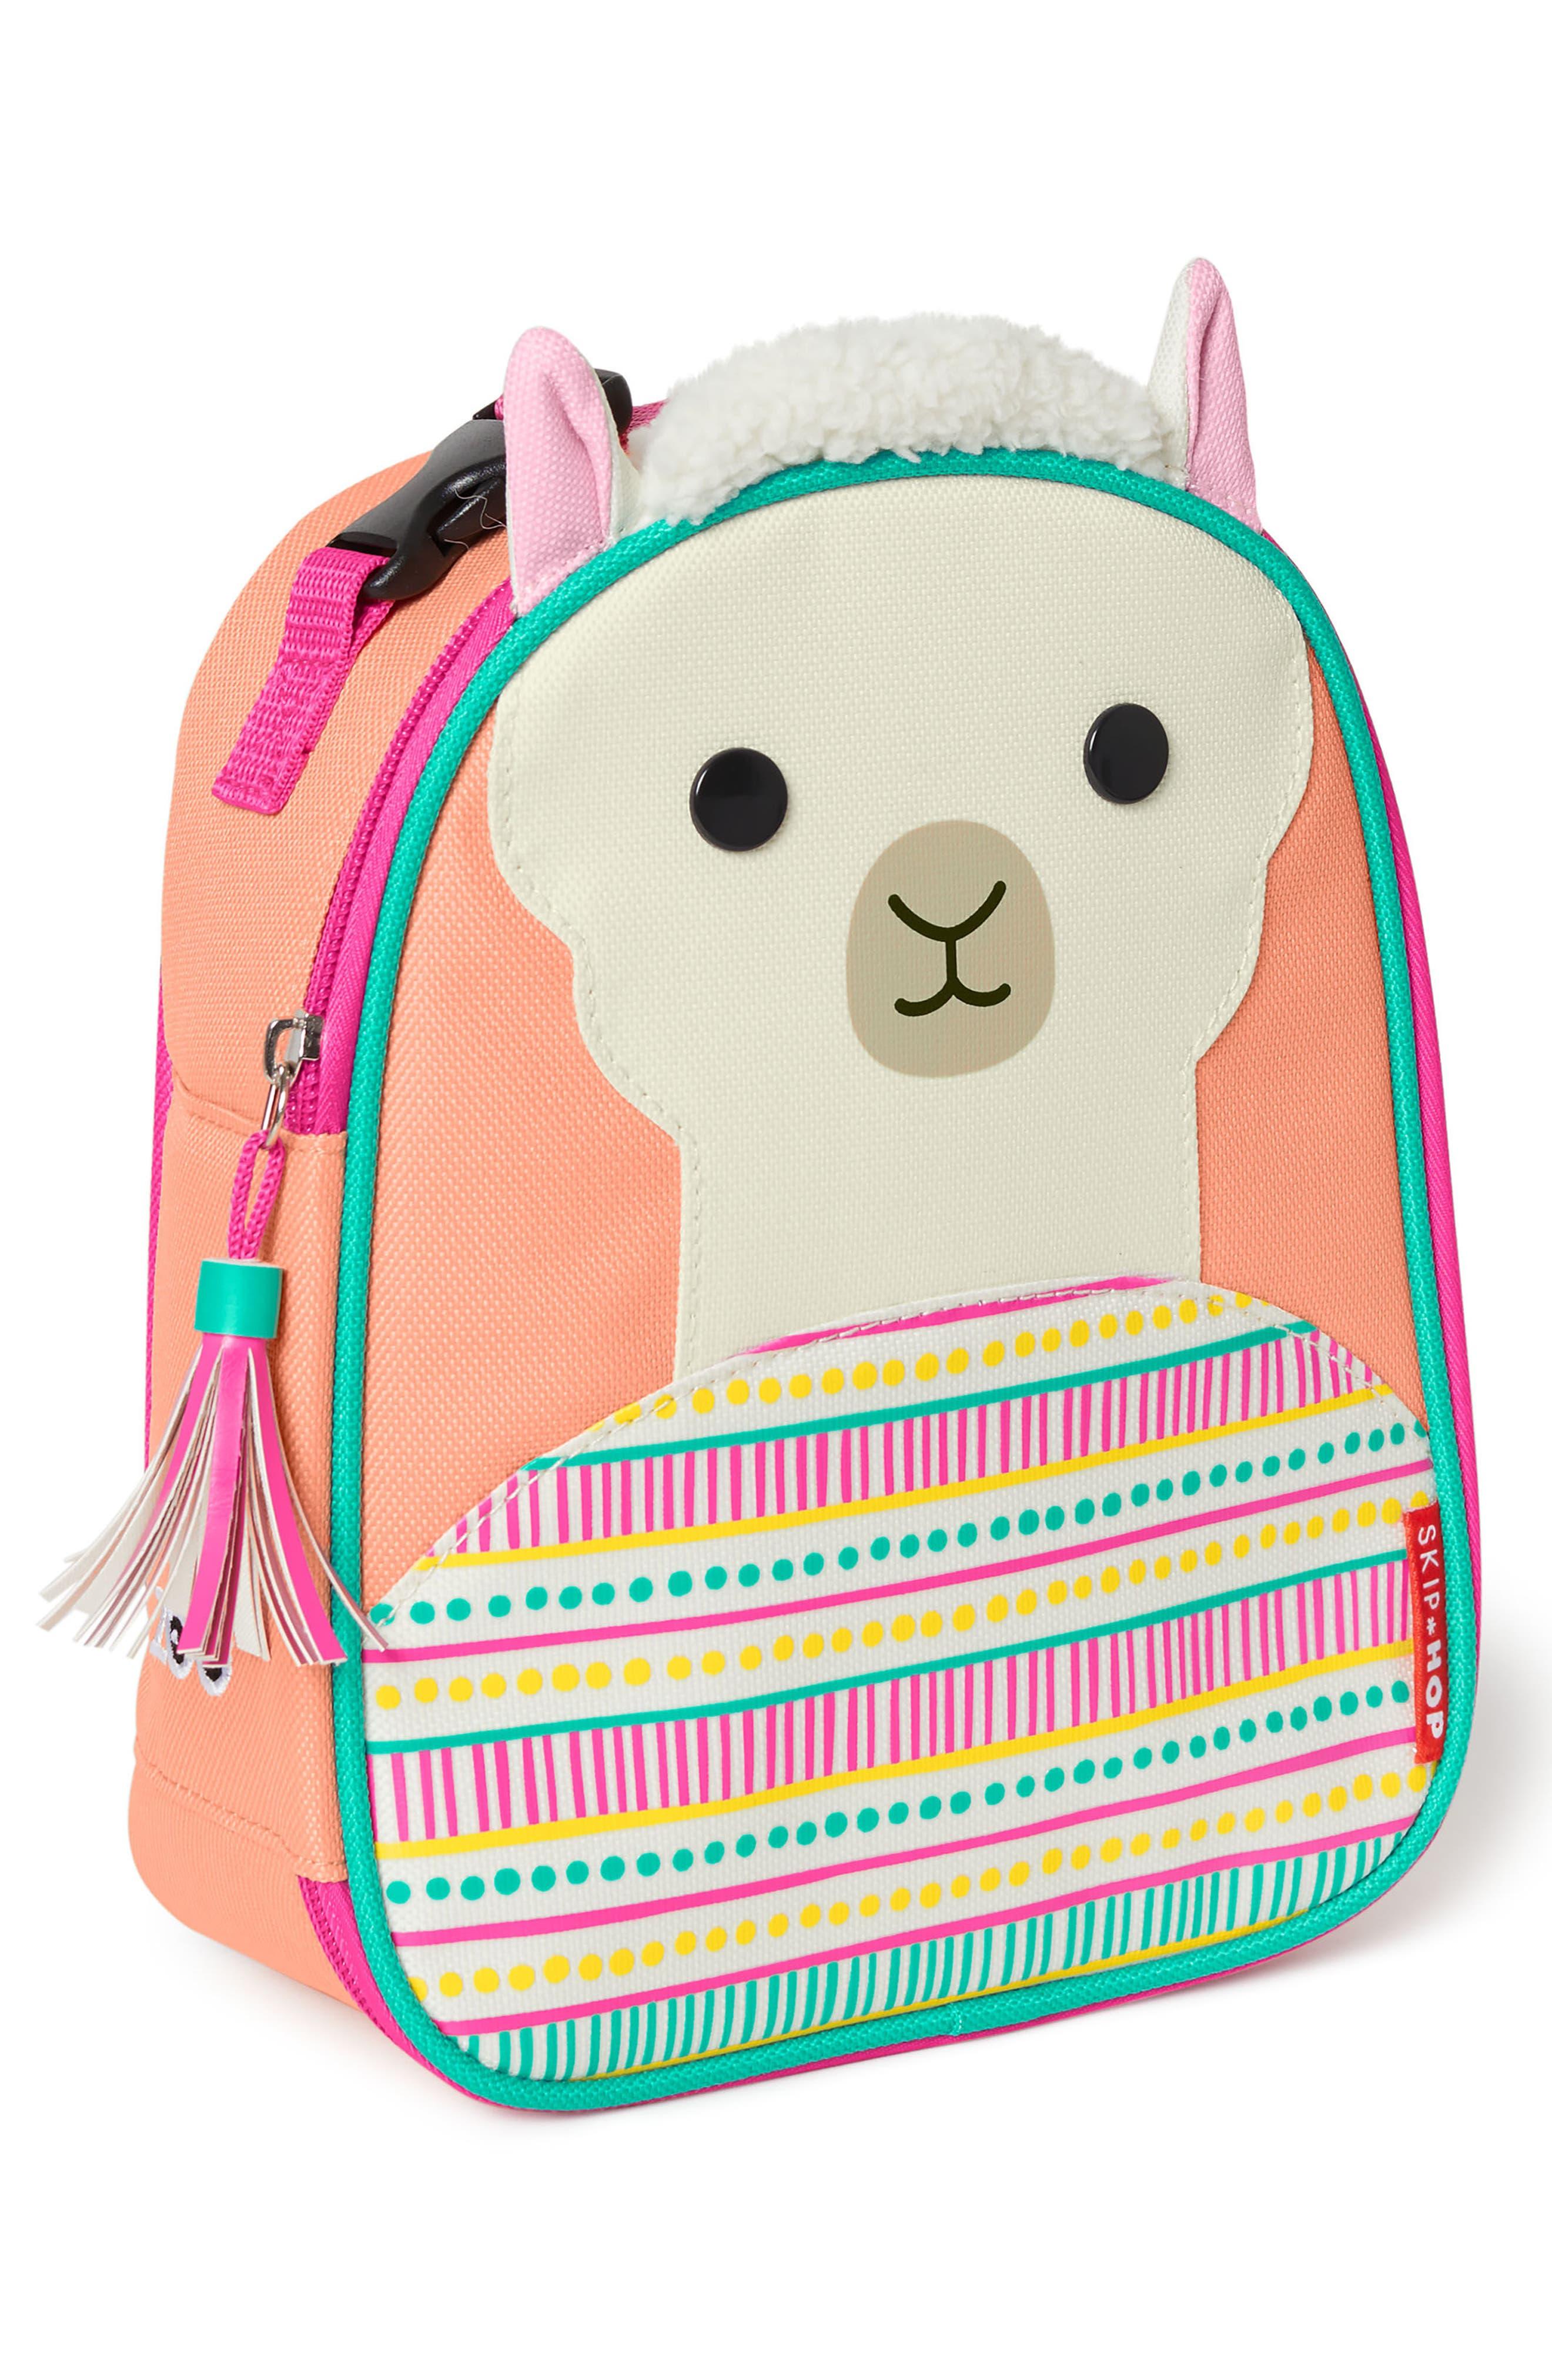 SKIP HOP,                             Insulated Llama Lunch Bag,                             Alternate thumbnail 2, color,                             PINK MULTI